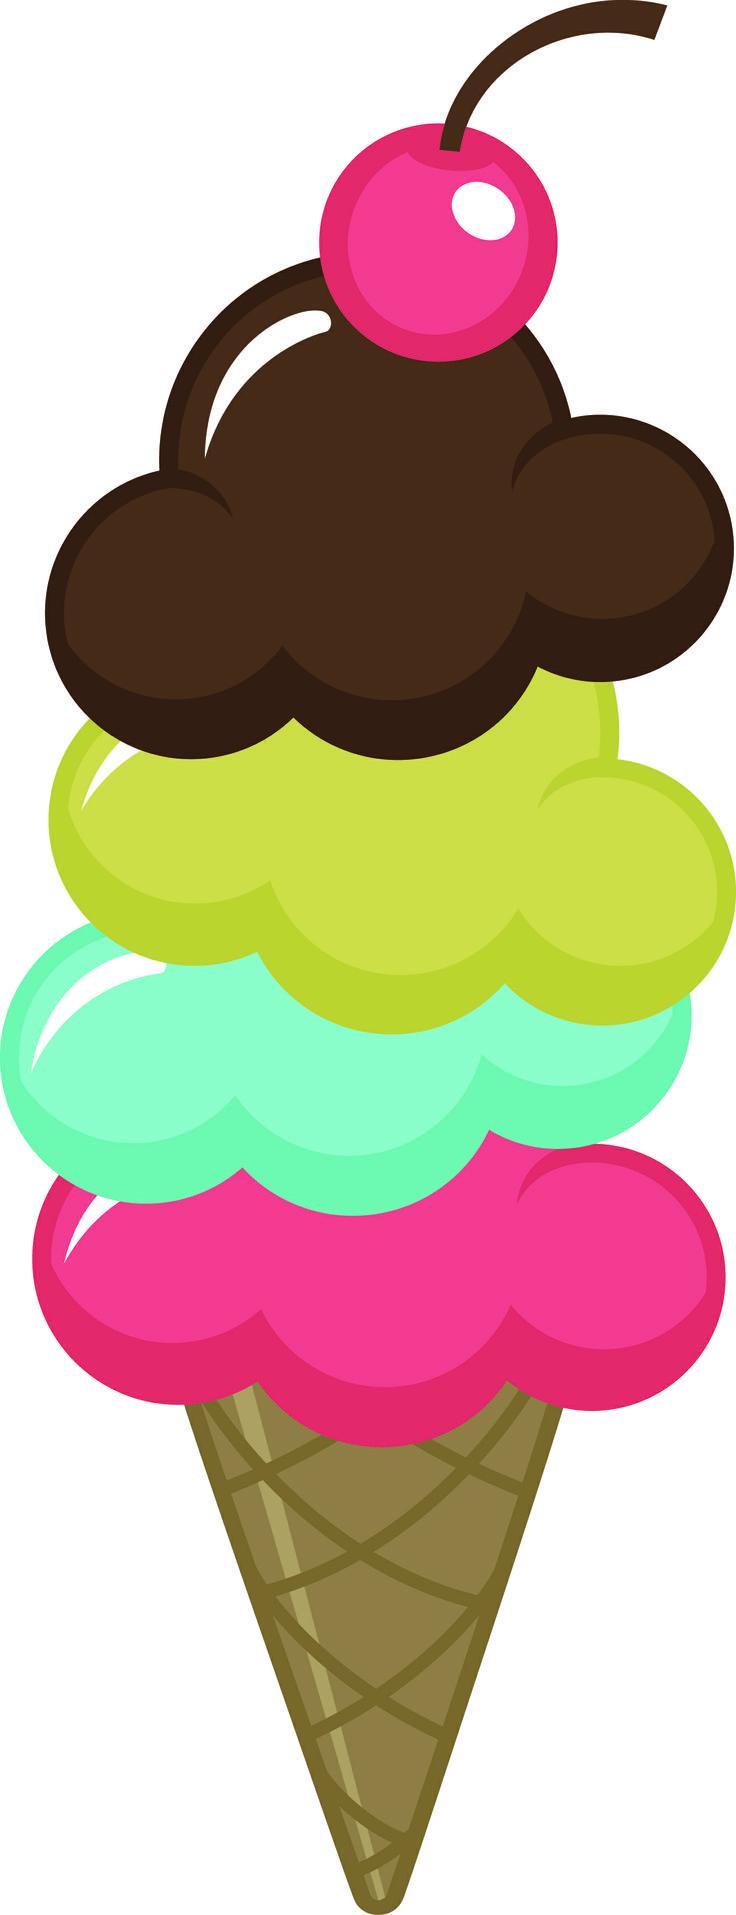 736x1915 Ice Cream Scoop Animated Ice Cream Clipart